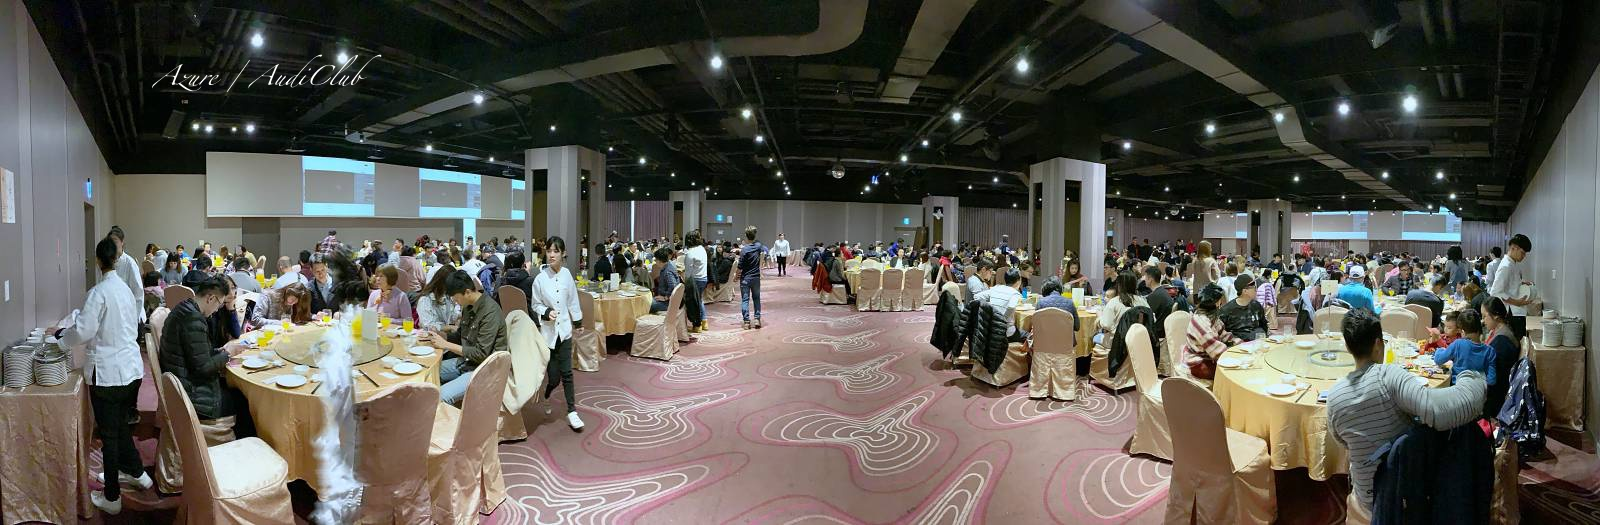 Audi-club全台奧迪車聚,超過兩百台奧迪齊聚苗栗尚順育樂中心